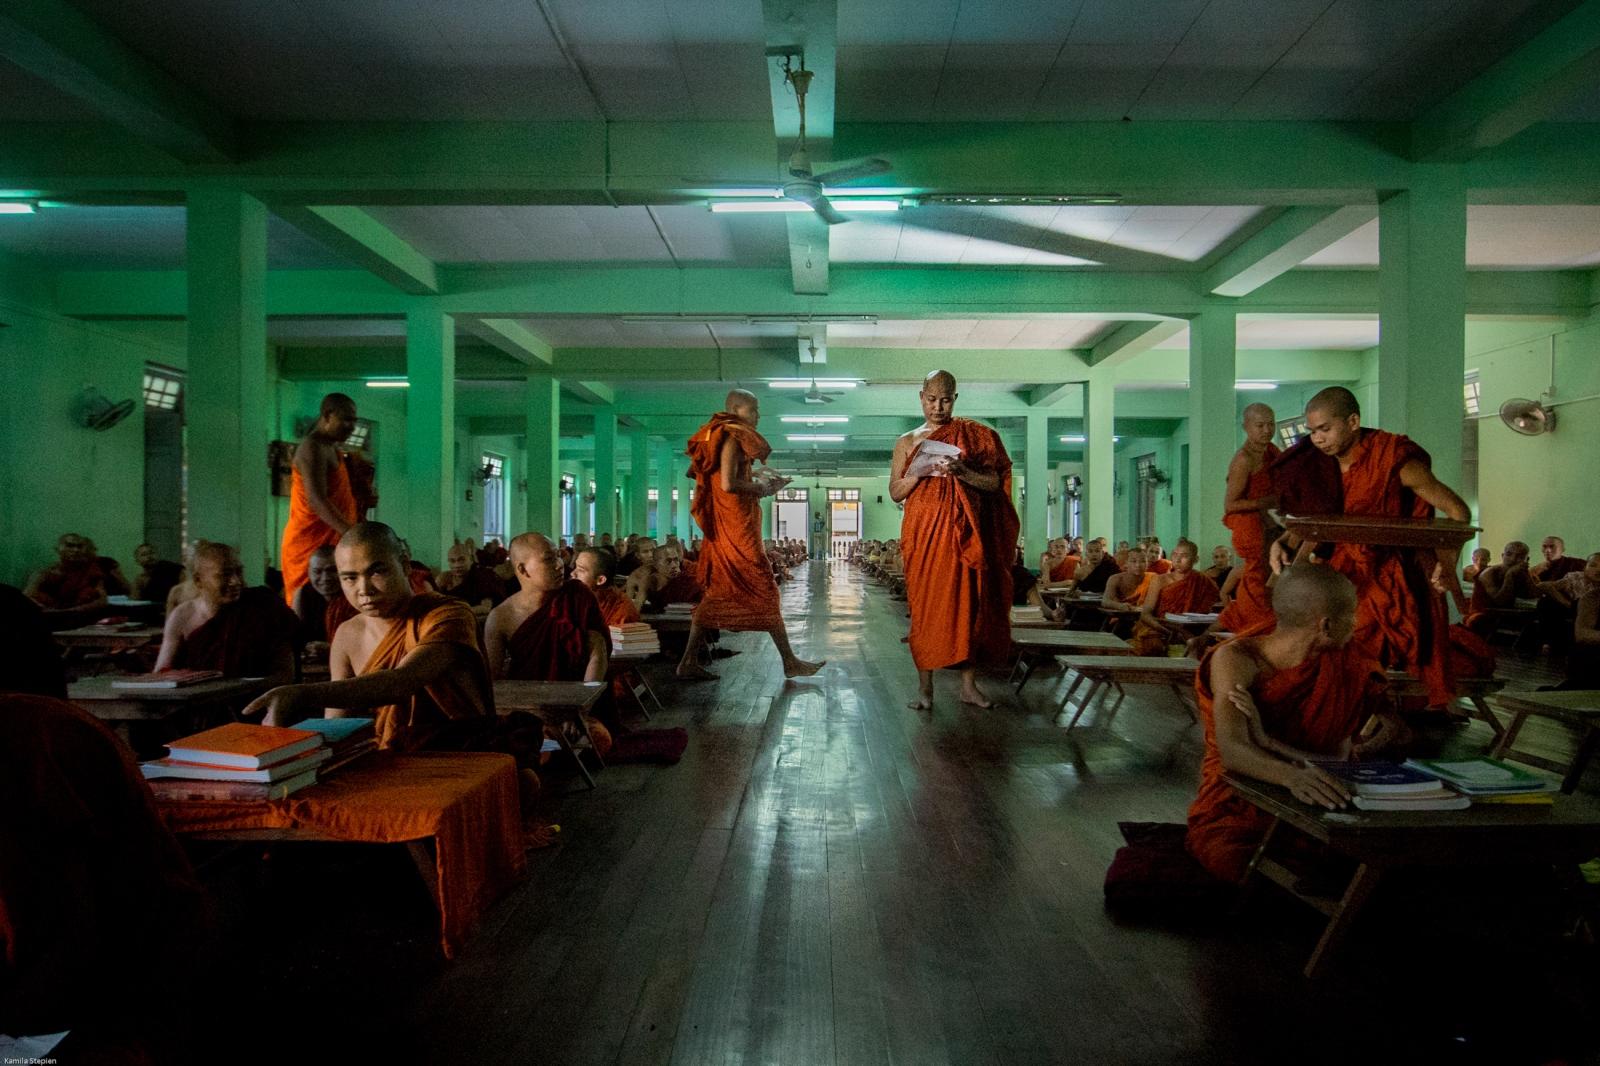 Photography image - Loading KS-Extremist_monks_(38_sur_59).jpg